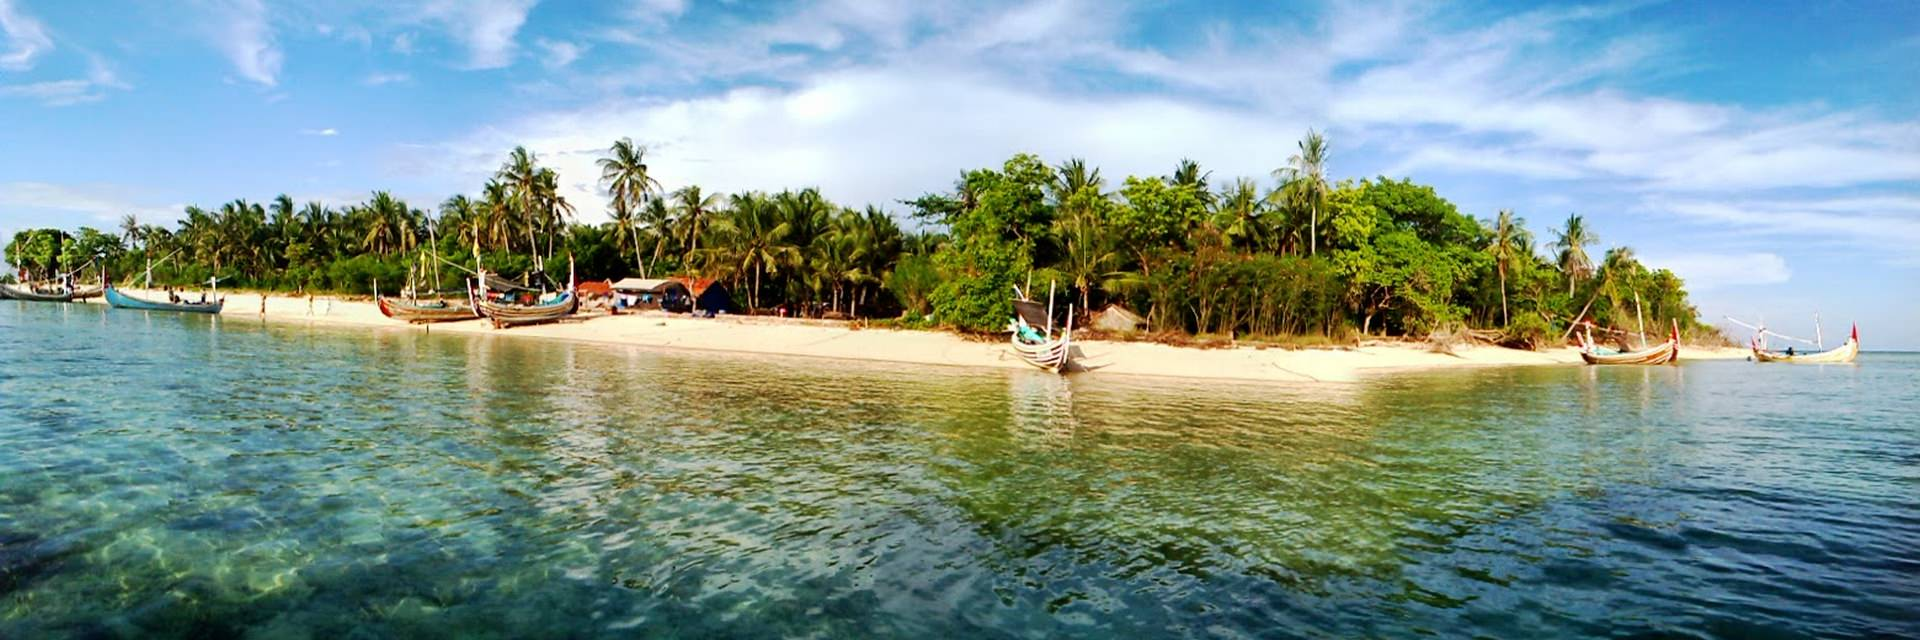 Gili Labak Sebongkah Surga di Pulau Madura Gili Labak Sebongkah Surga di Pulau Madura - Dolan Dolen